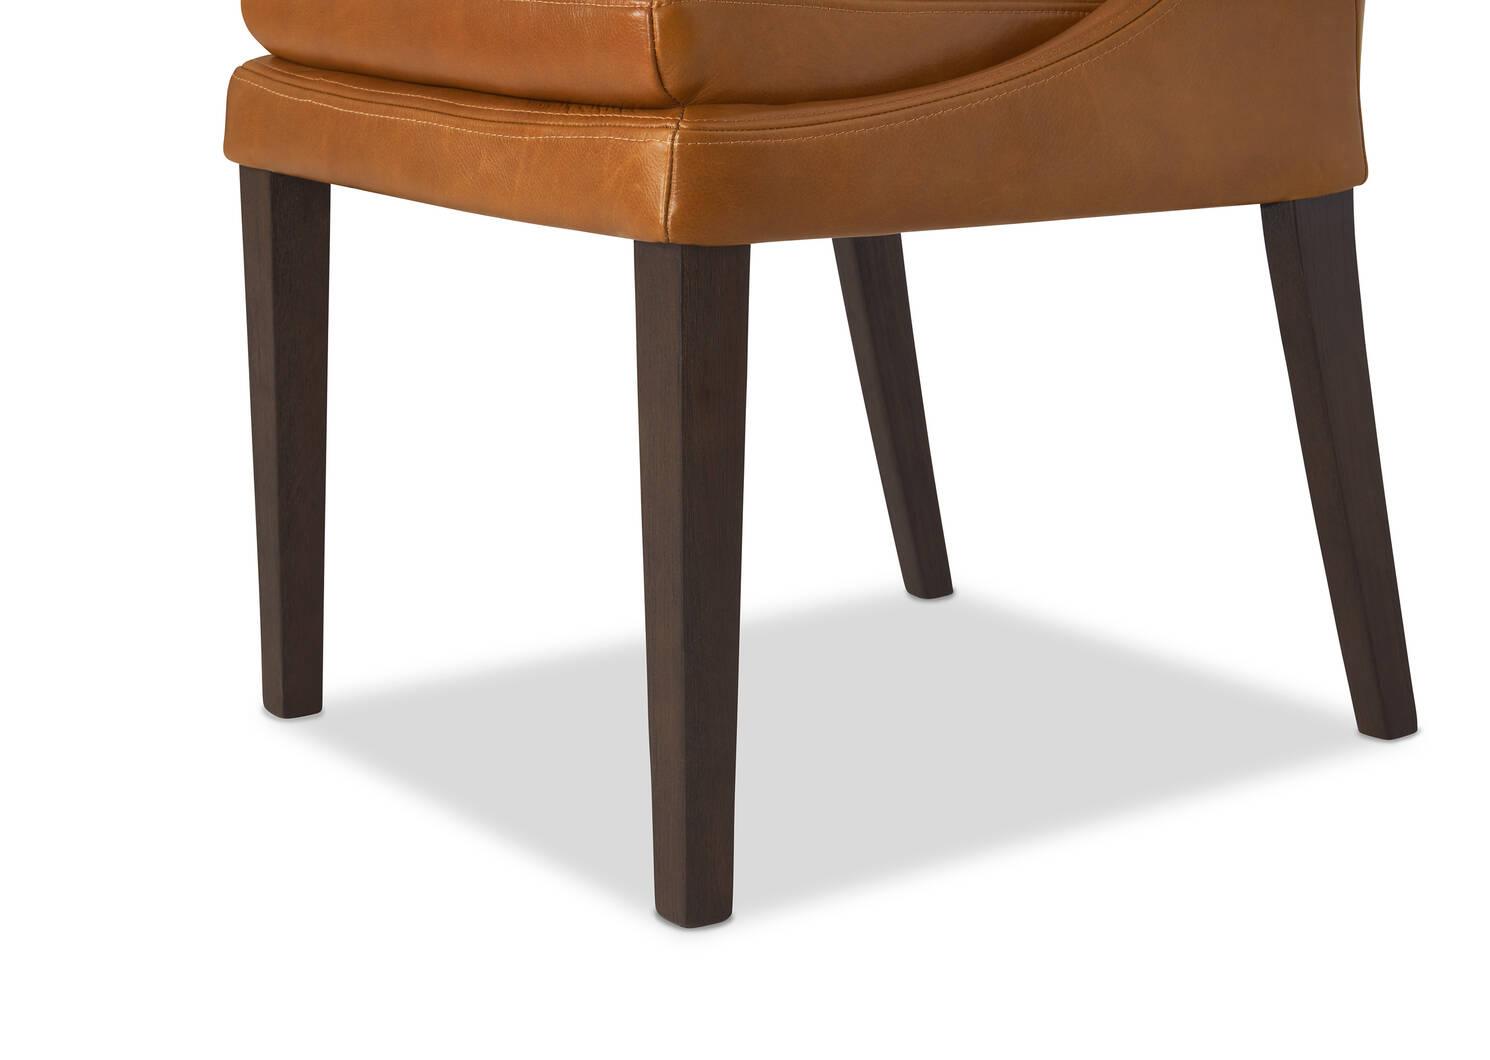 Montana Dining Chair -Lakeshore Umber